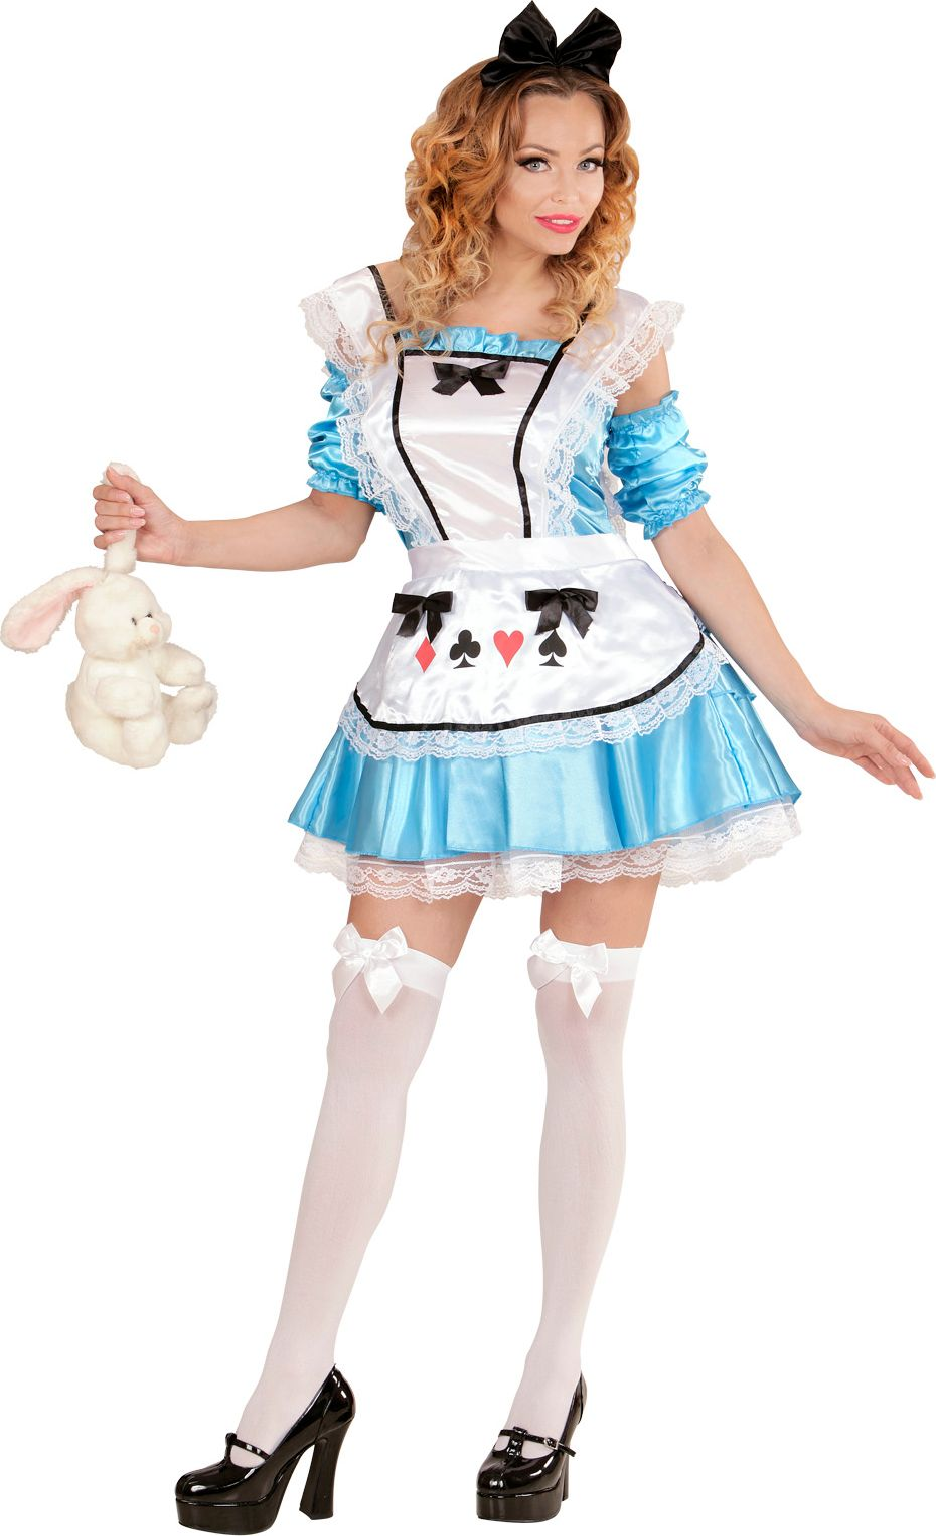 Alice in Wonderland carnaval